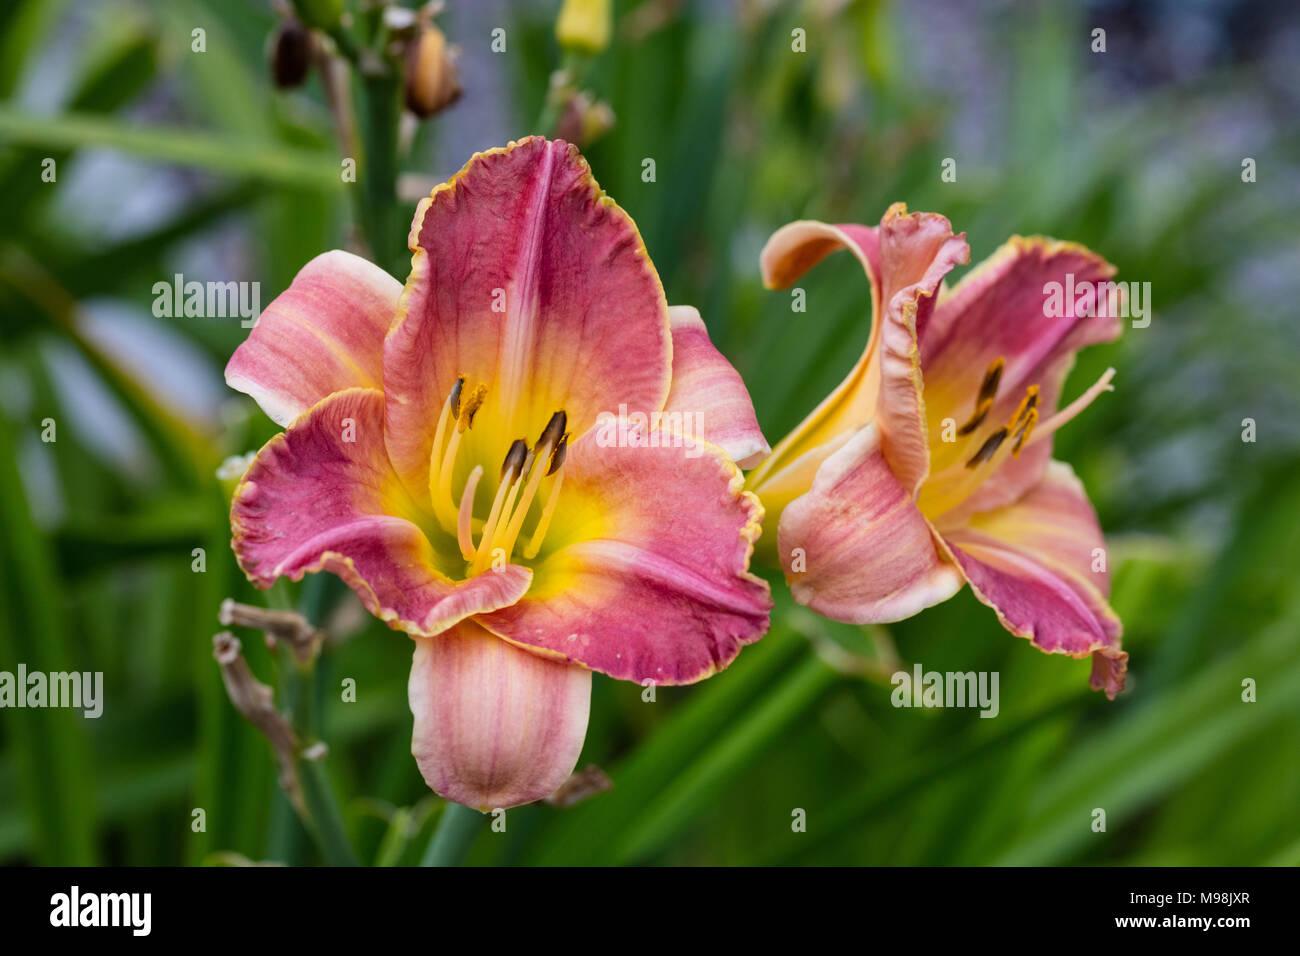 'Truly Angelic' Daylily, Daglilja (Hemerocallis) - Stock Image